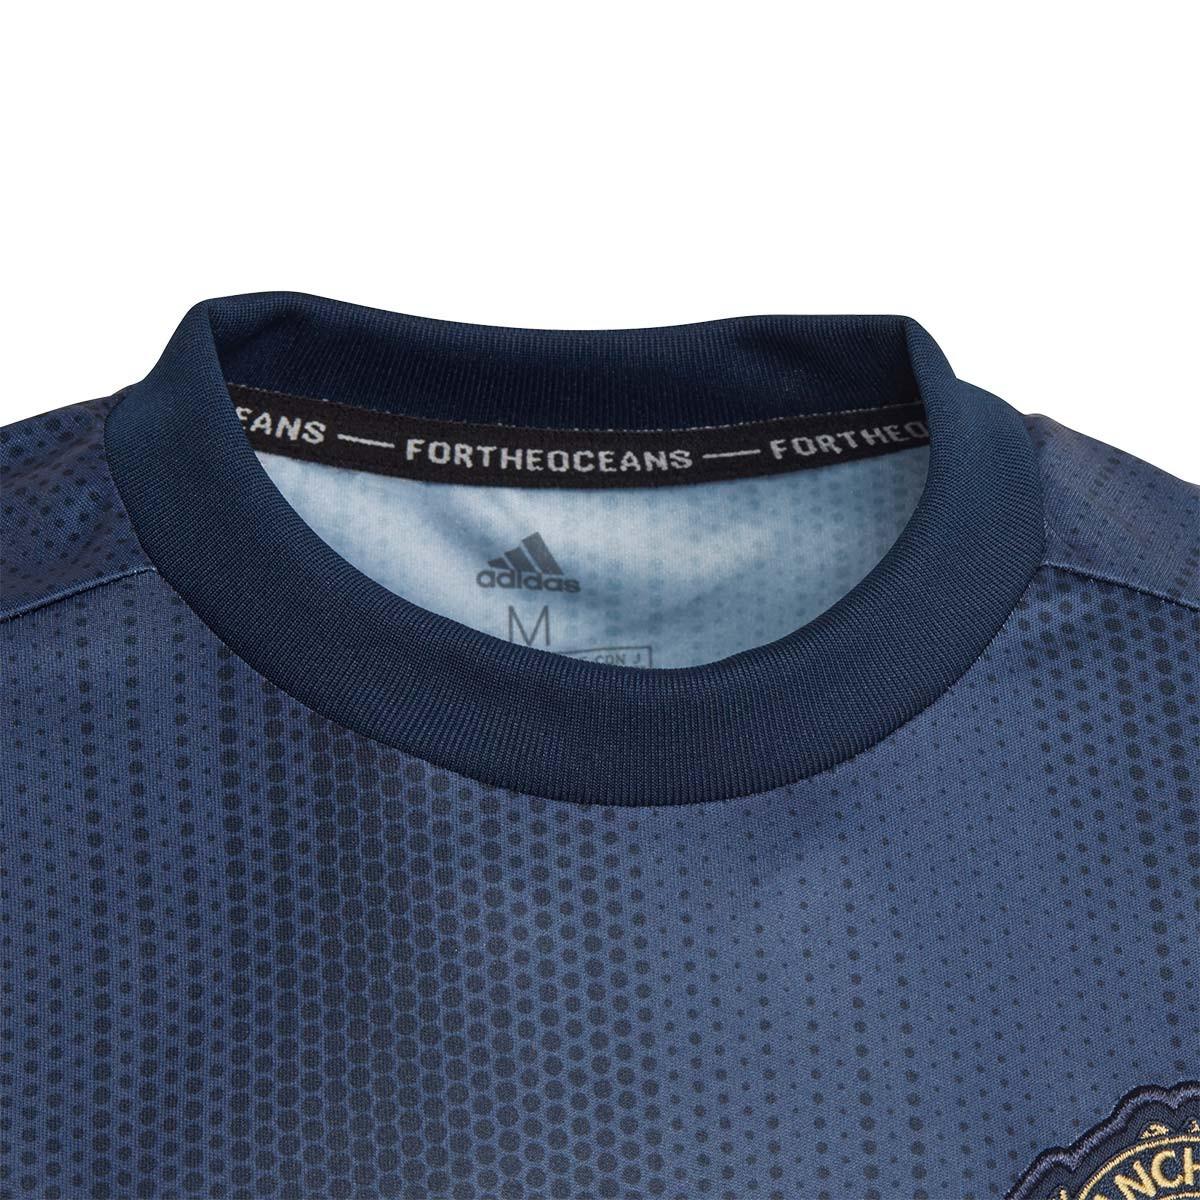 4ffc52a59 Jersey adidas Manchester United FC 2018-2019 Third Collegiate navy-Night  navy-Matte gold - Football store Fútbol Emotion